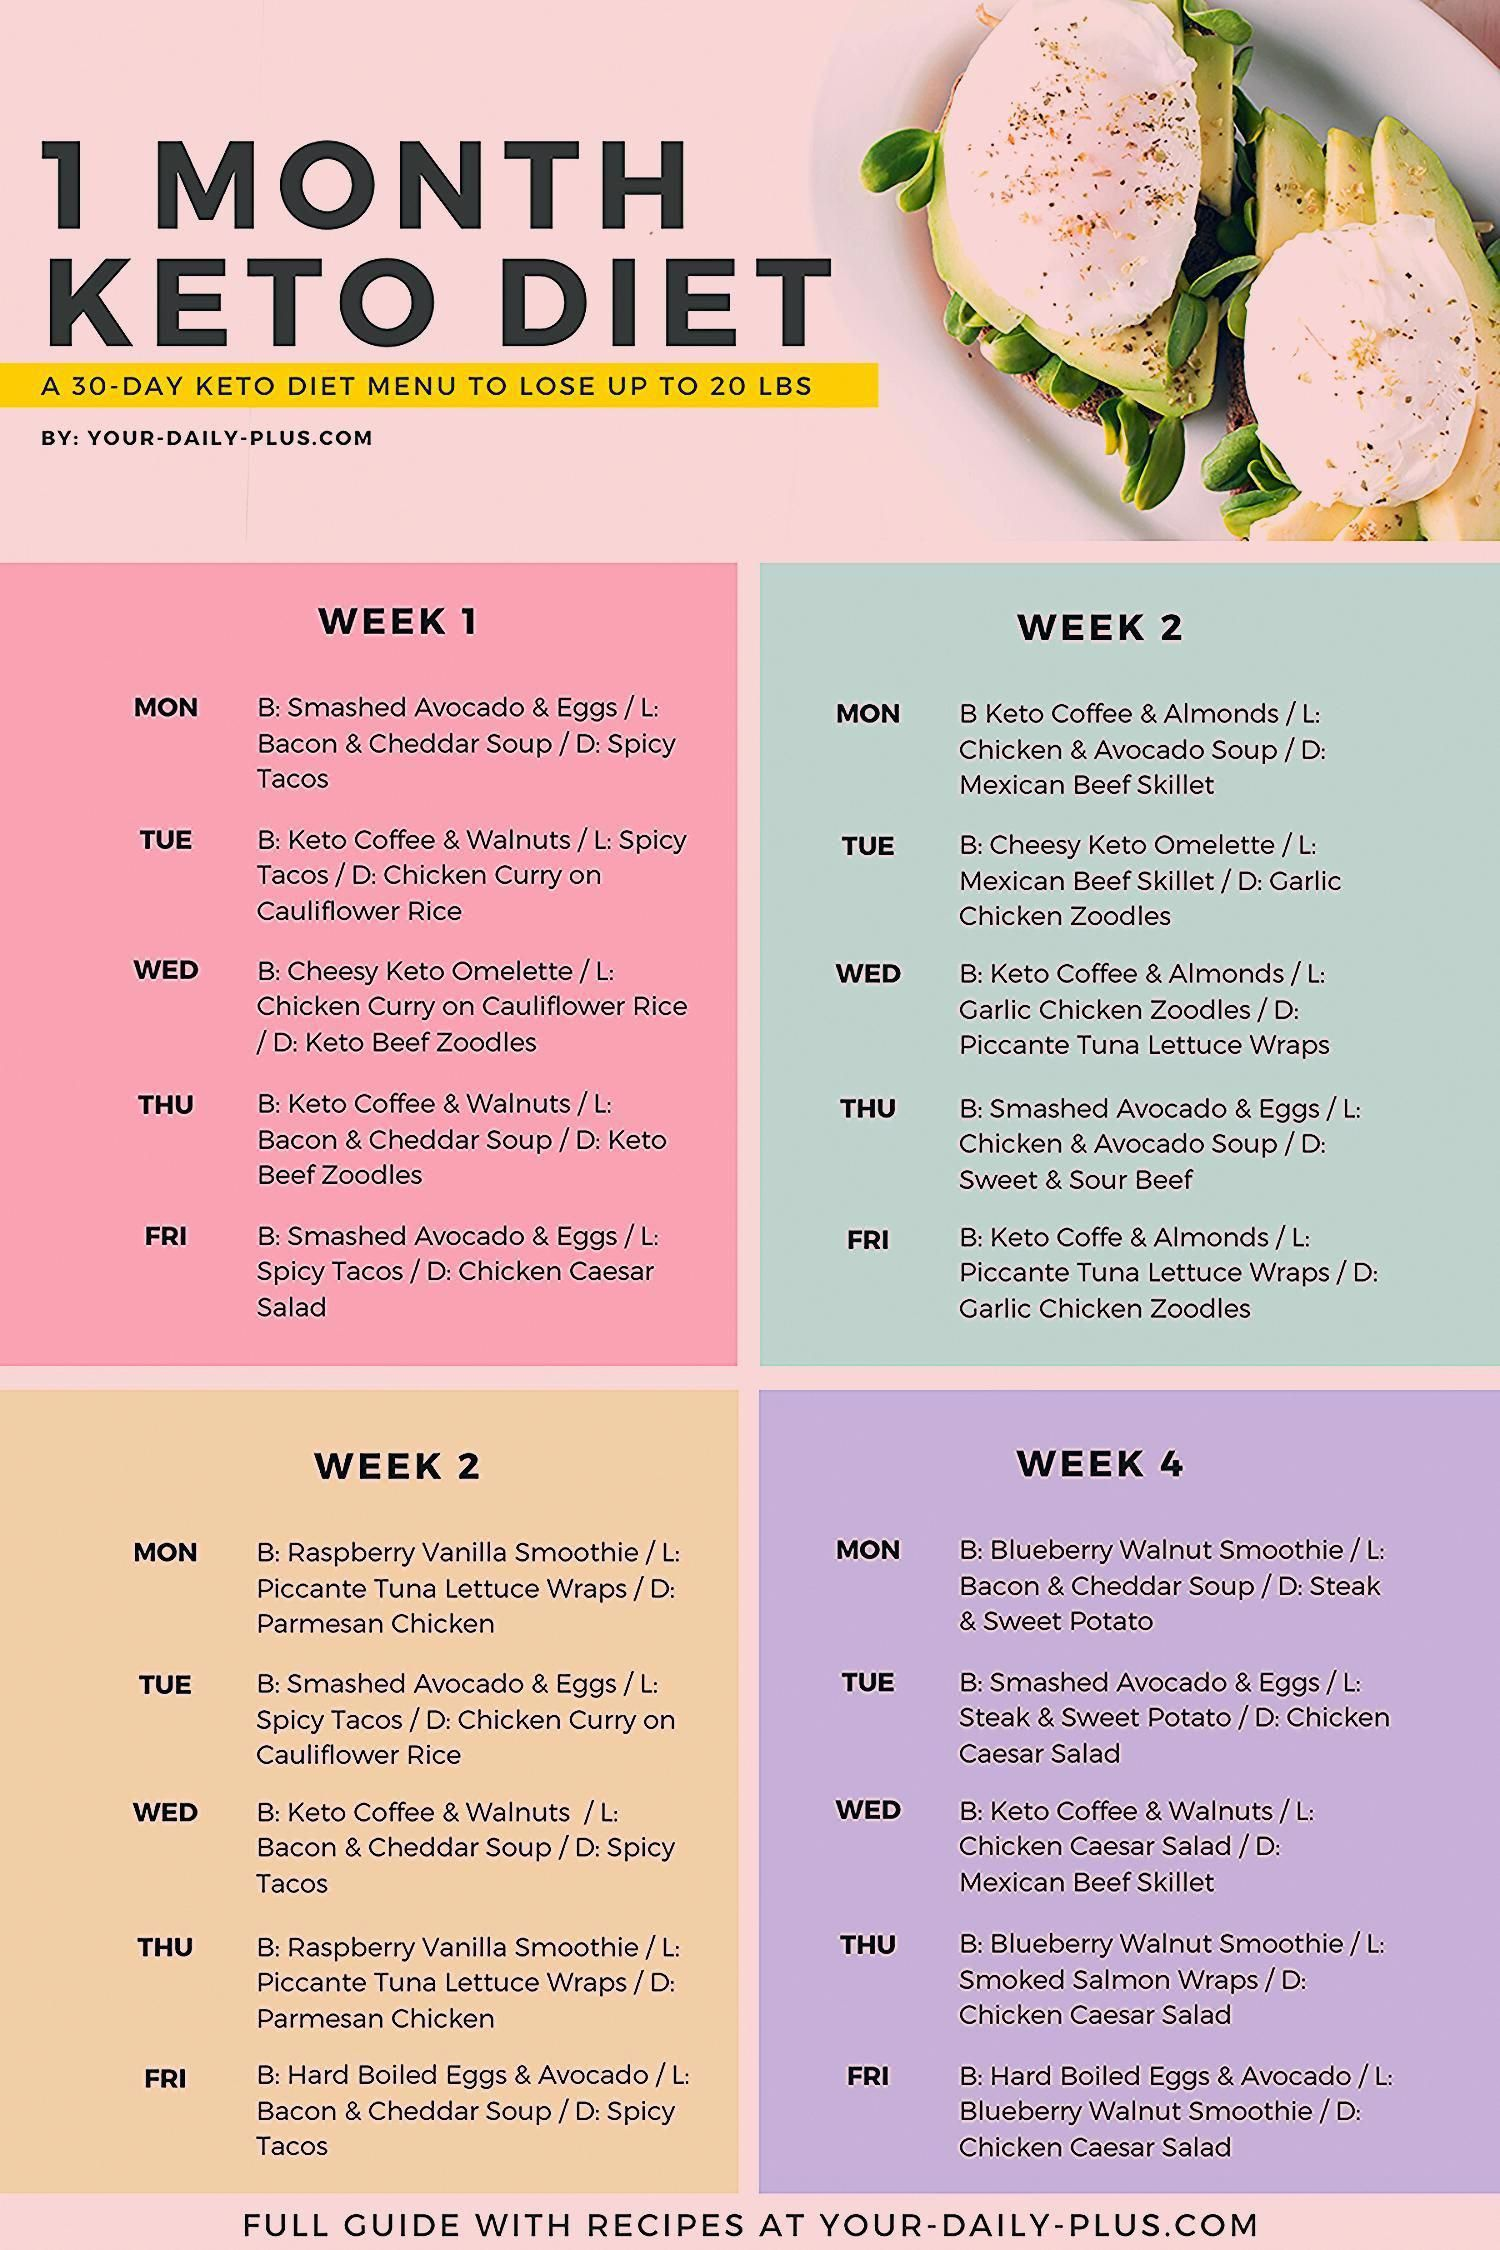 Keto Diet Food Options 7dayketodietplan In 2020 Ketogenic Diet Meal Plan Ketogenic Diet Food List Juice Diet